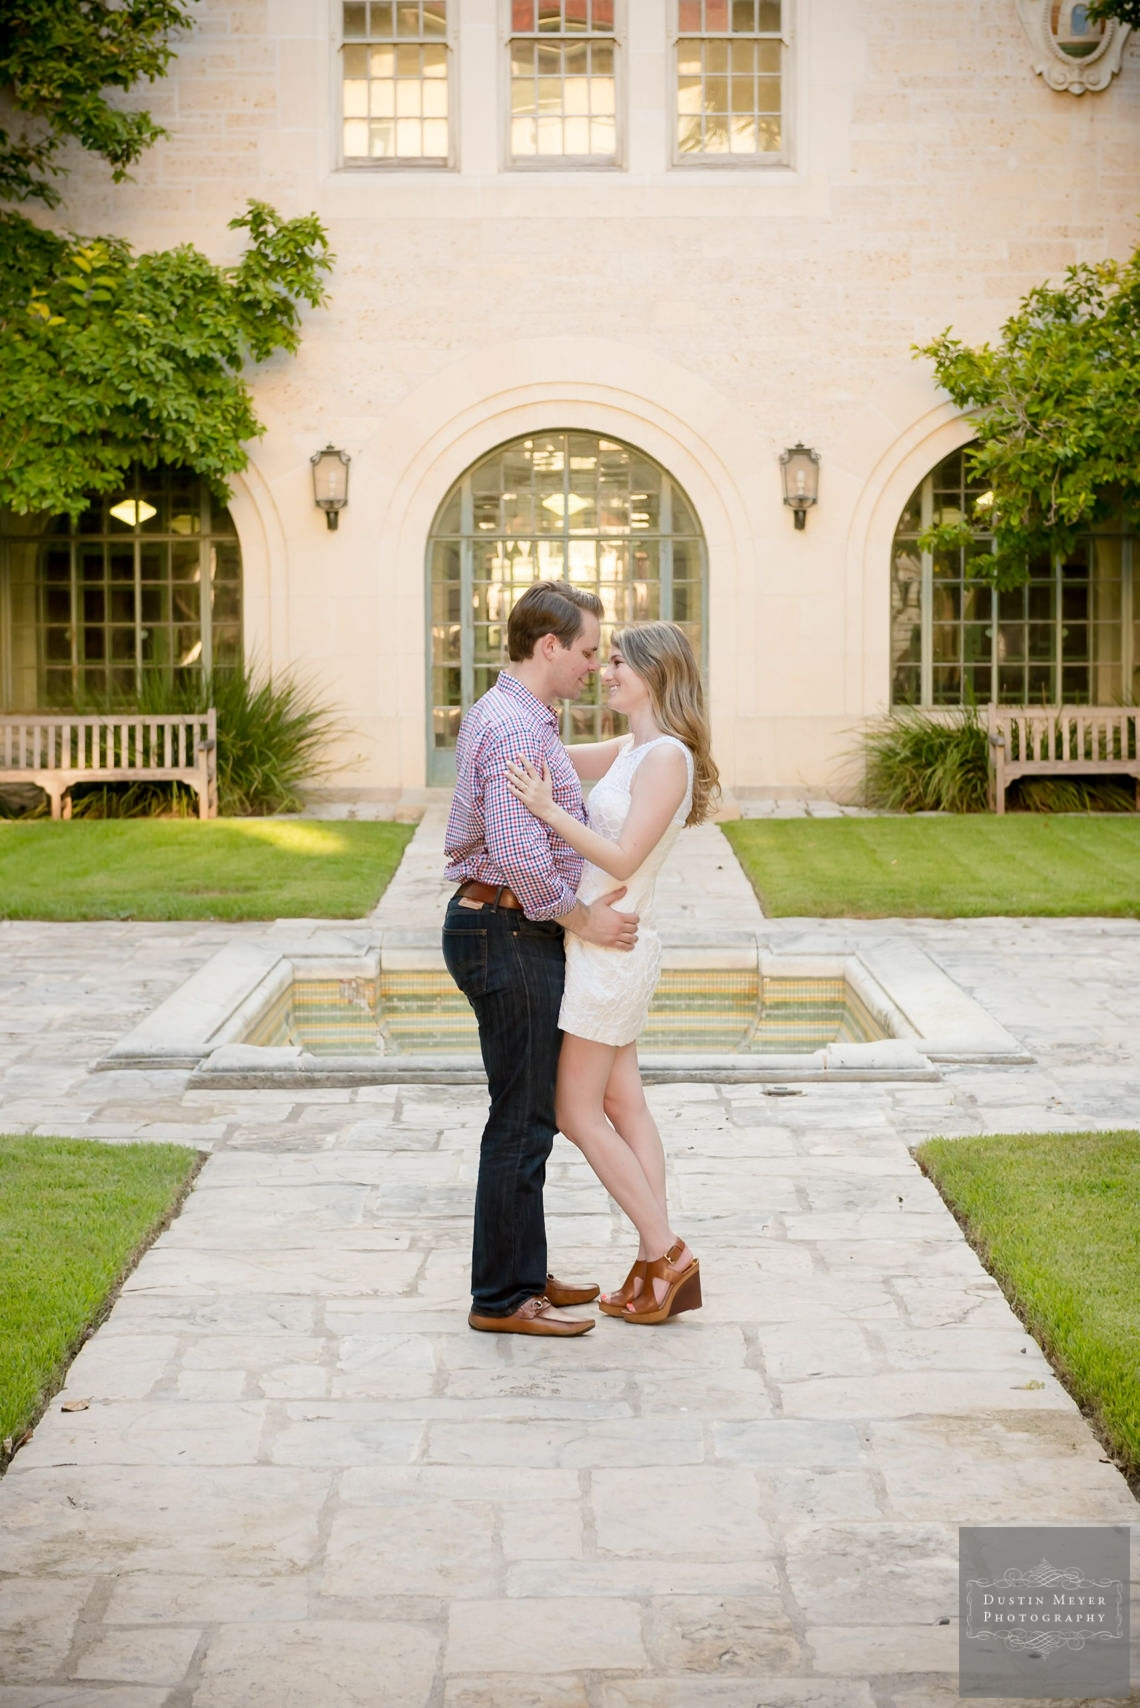 Engagement portraits ideas poses austin tx dustin meyer photography